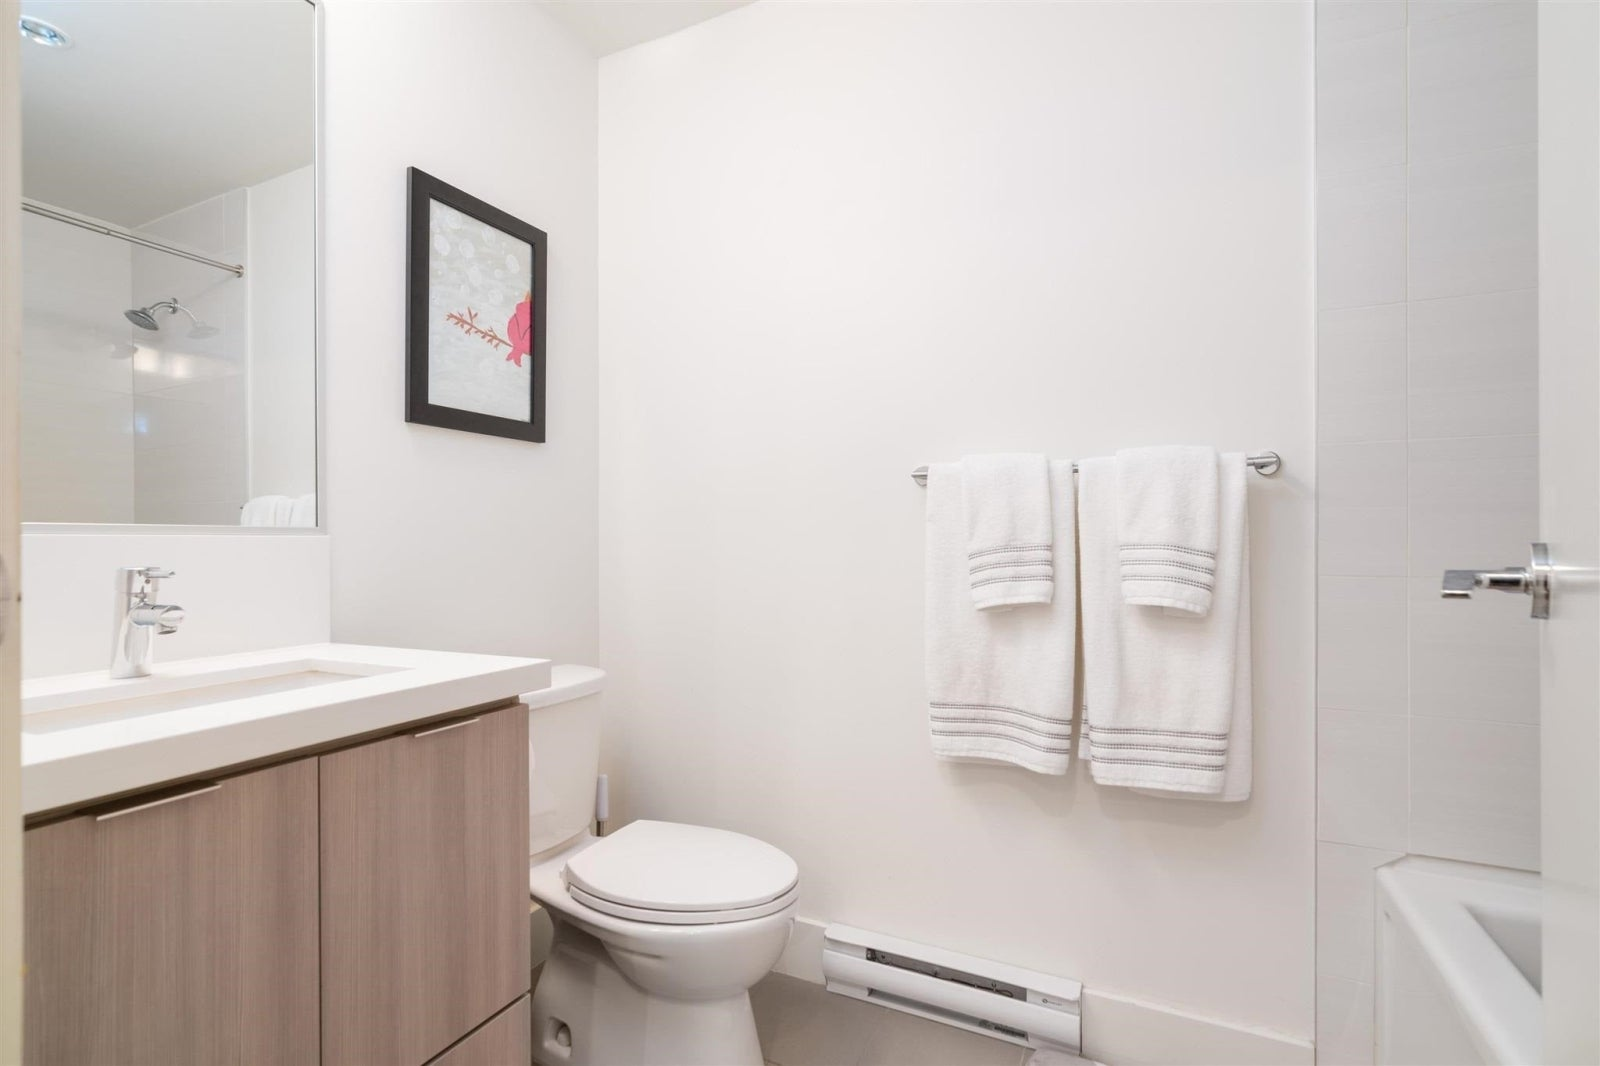 222 3602 ALDERCREST DRIVE - Roche Point Apartment/Condo for sale, 2 Bedrooms (R2603975) #14